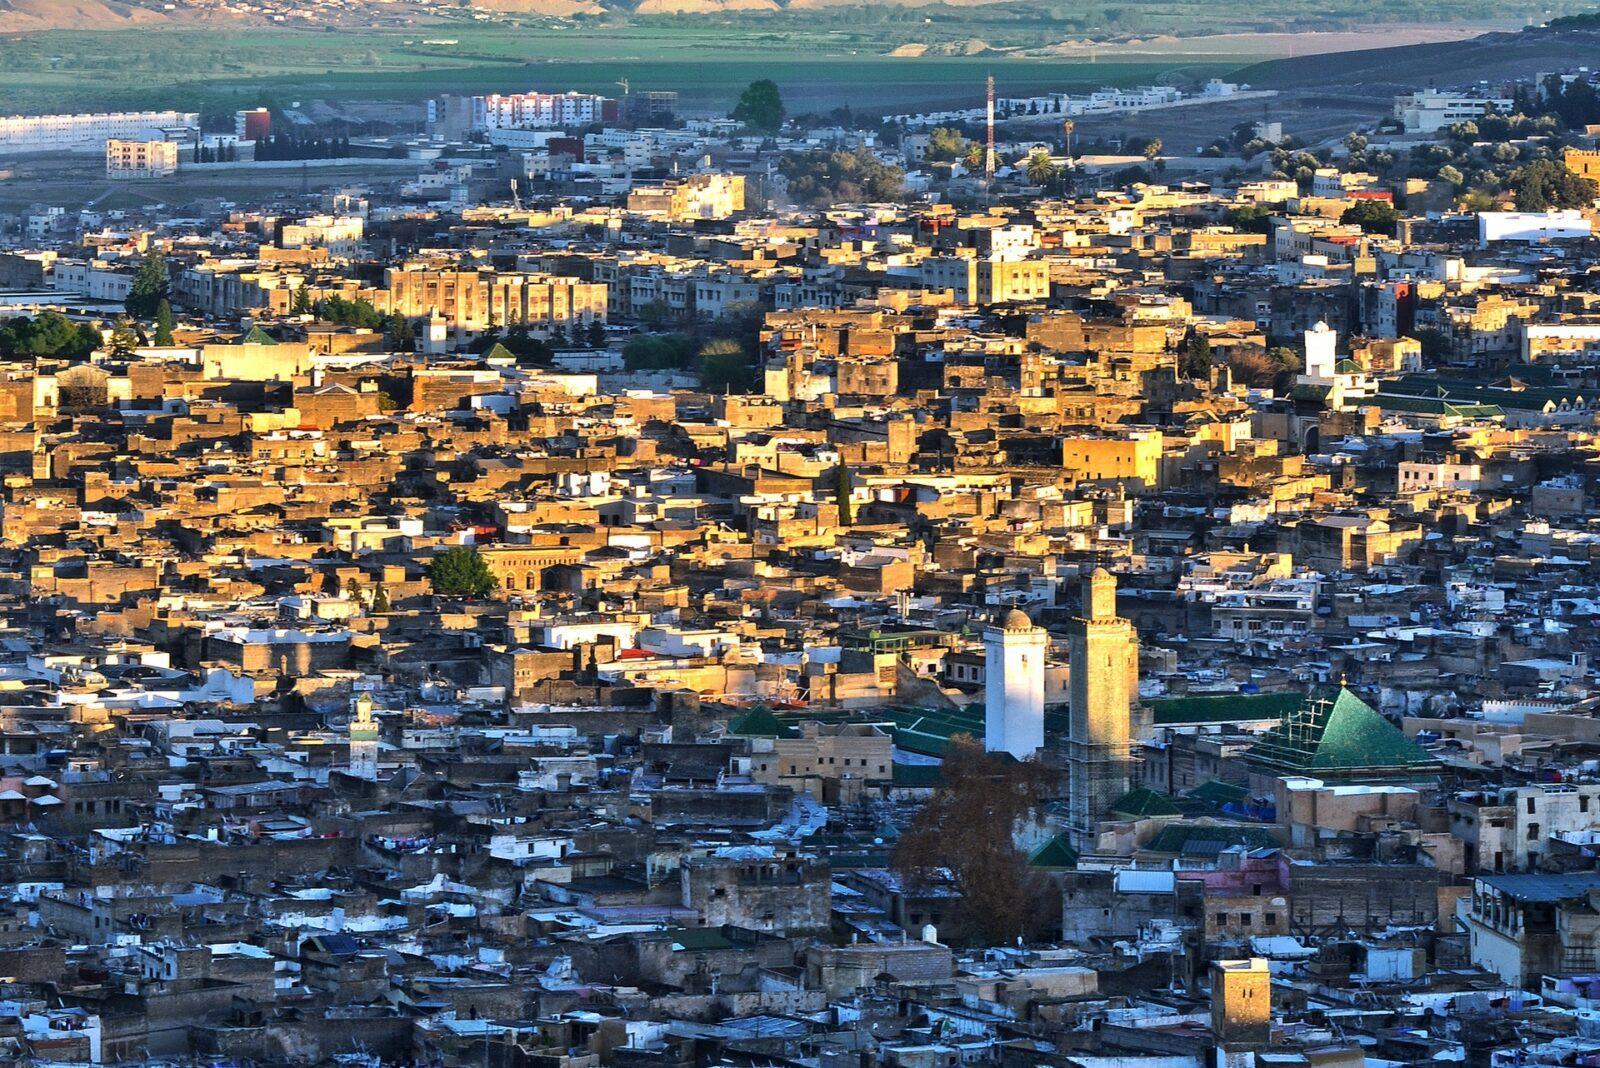 pexels moussa idrissi 3726633 1536x1026 - Guide Morocco Tours